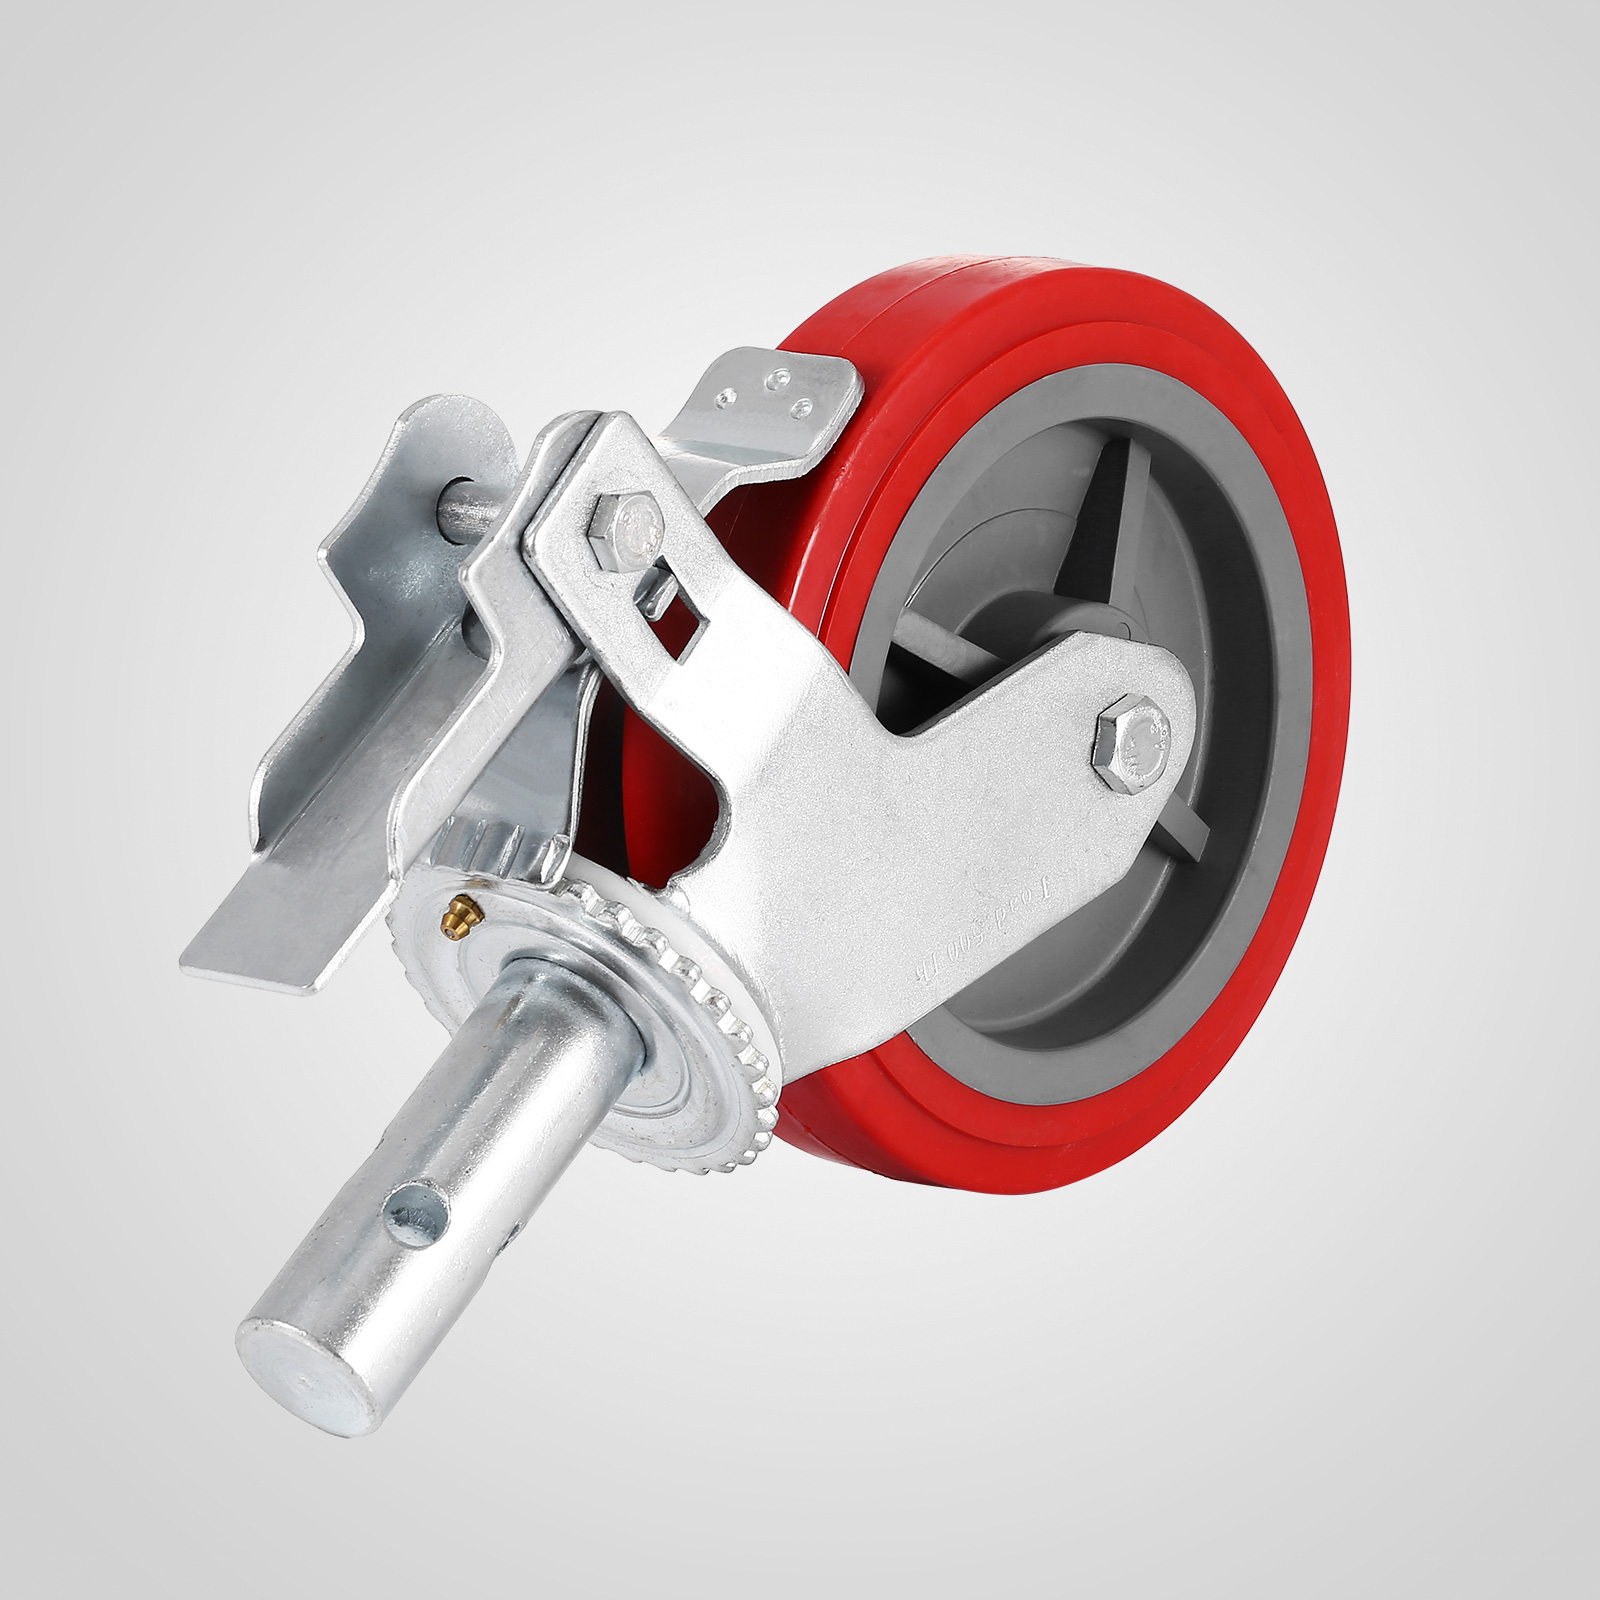 "Alloy 8"" x 2"" Polyurethane Castors Scaffold Wheels Set of 4 Casters"